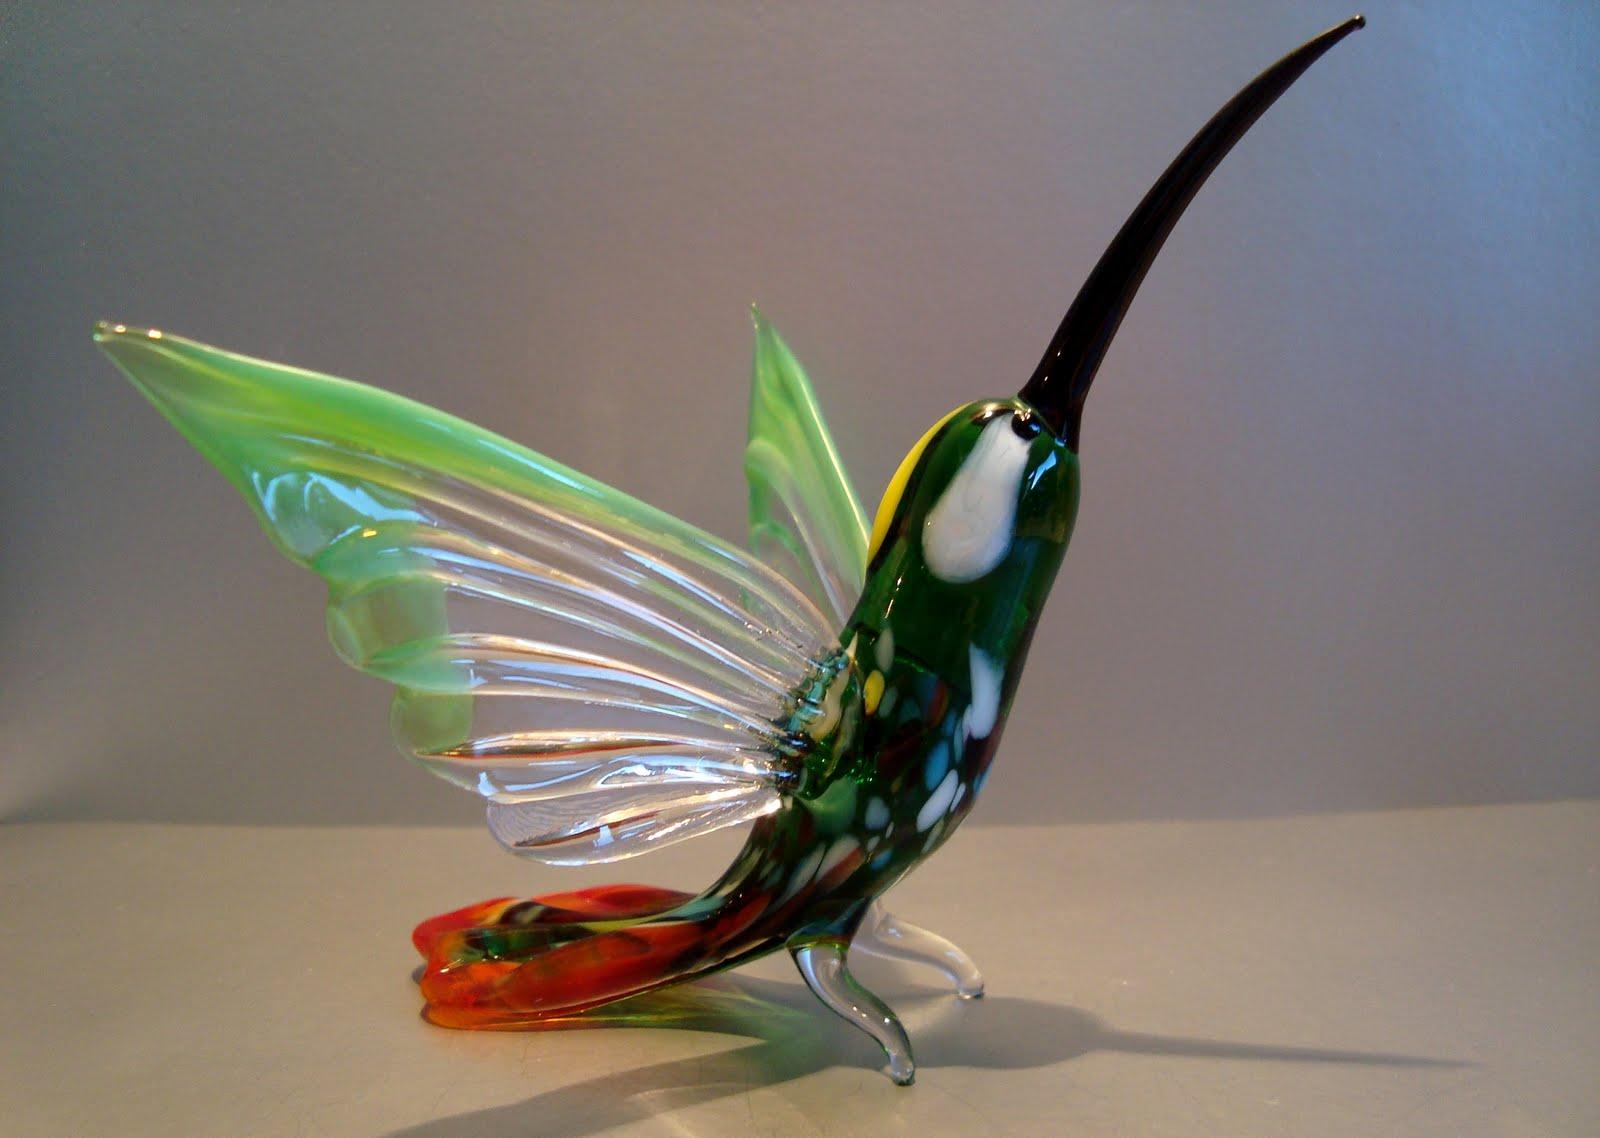 Grants glass - изделия и игрушки из стекла: Птицы, бабочки ...